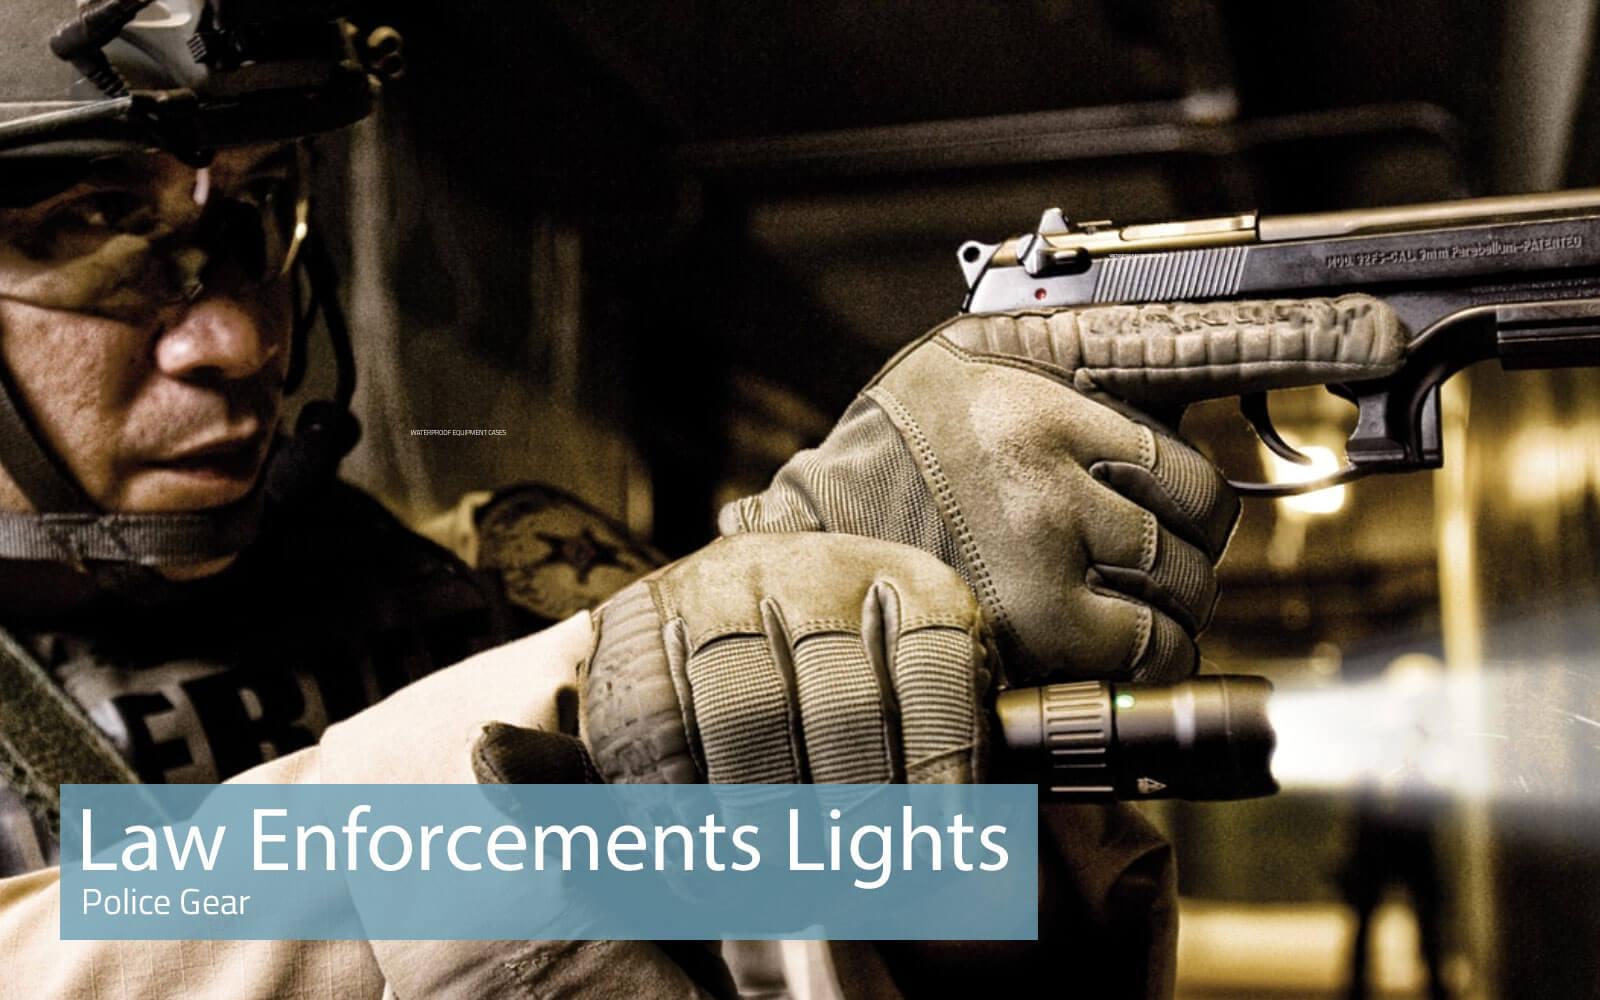 Peli Law Enforcements Lights